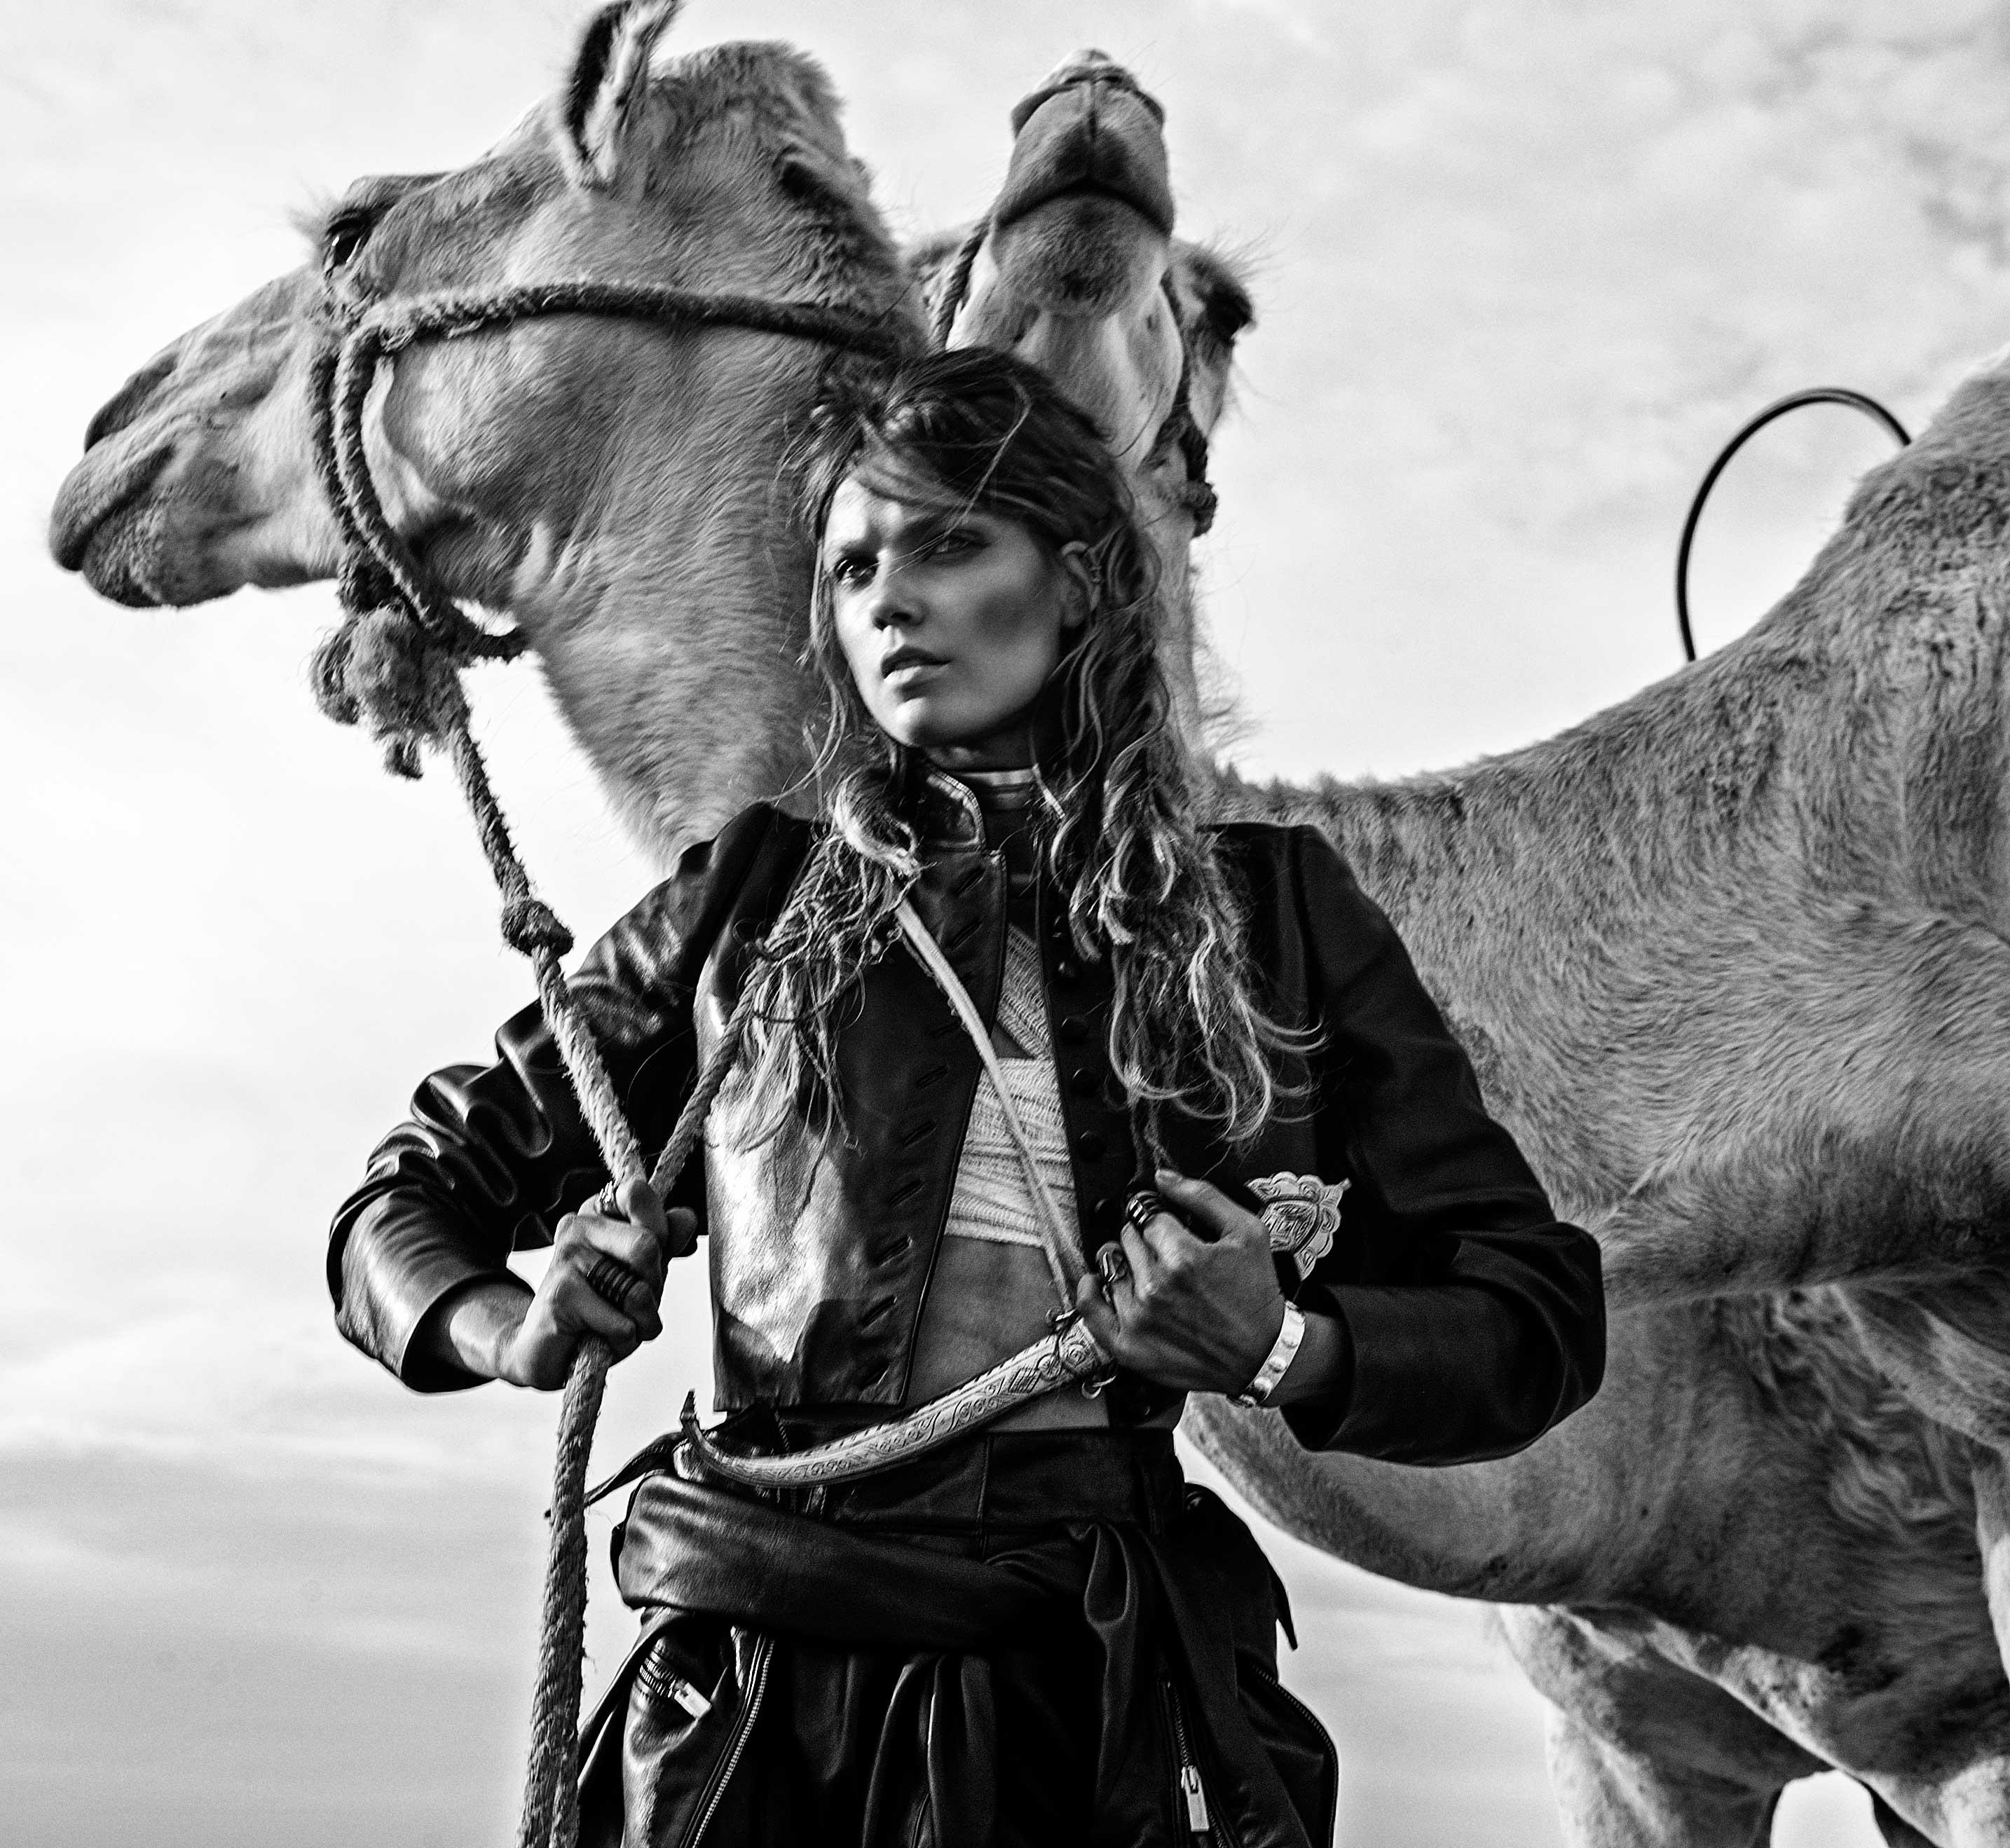 FAR HORIZONS – Harper's Bazaar Kazakhstan | SY DELORME